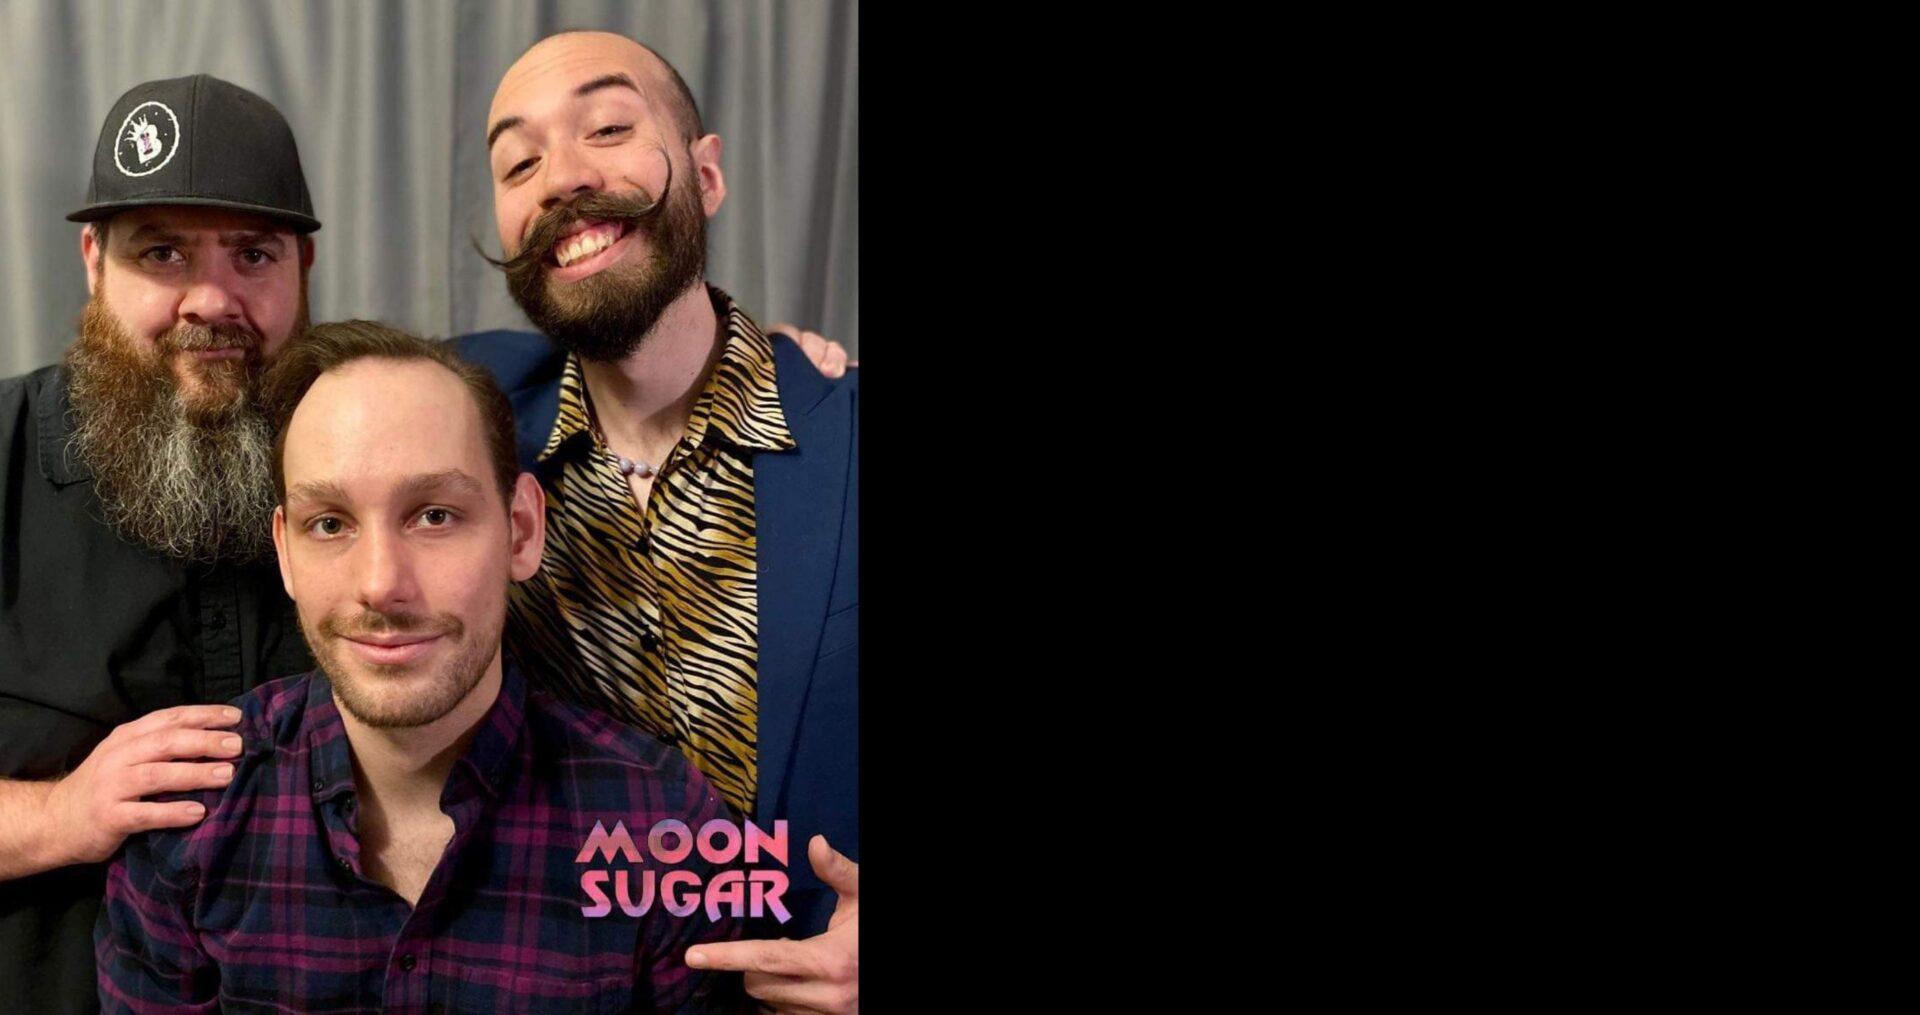 Music City Mondays REPLAY featuring Moon Sugar